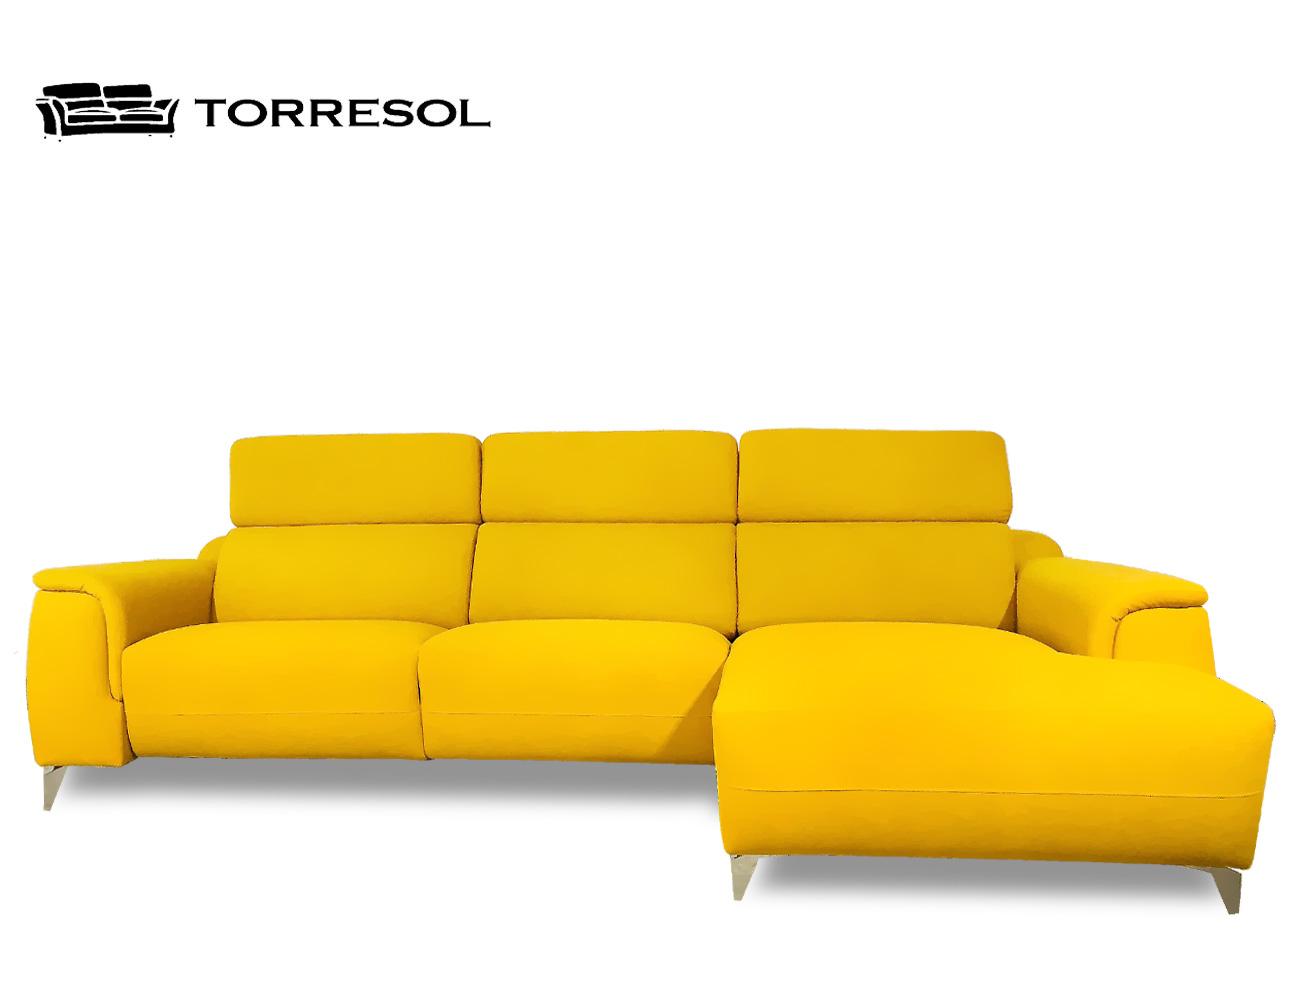 Sofa ralph torresol 6